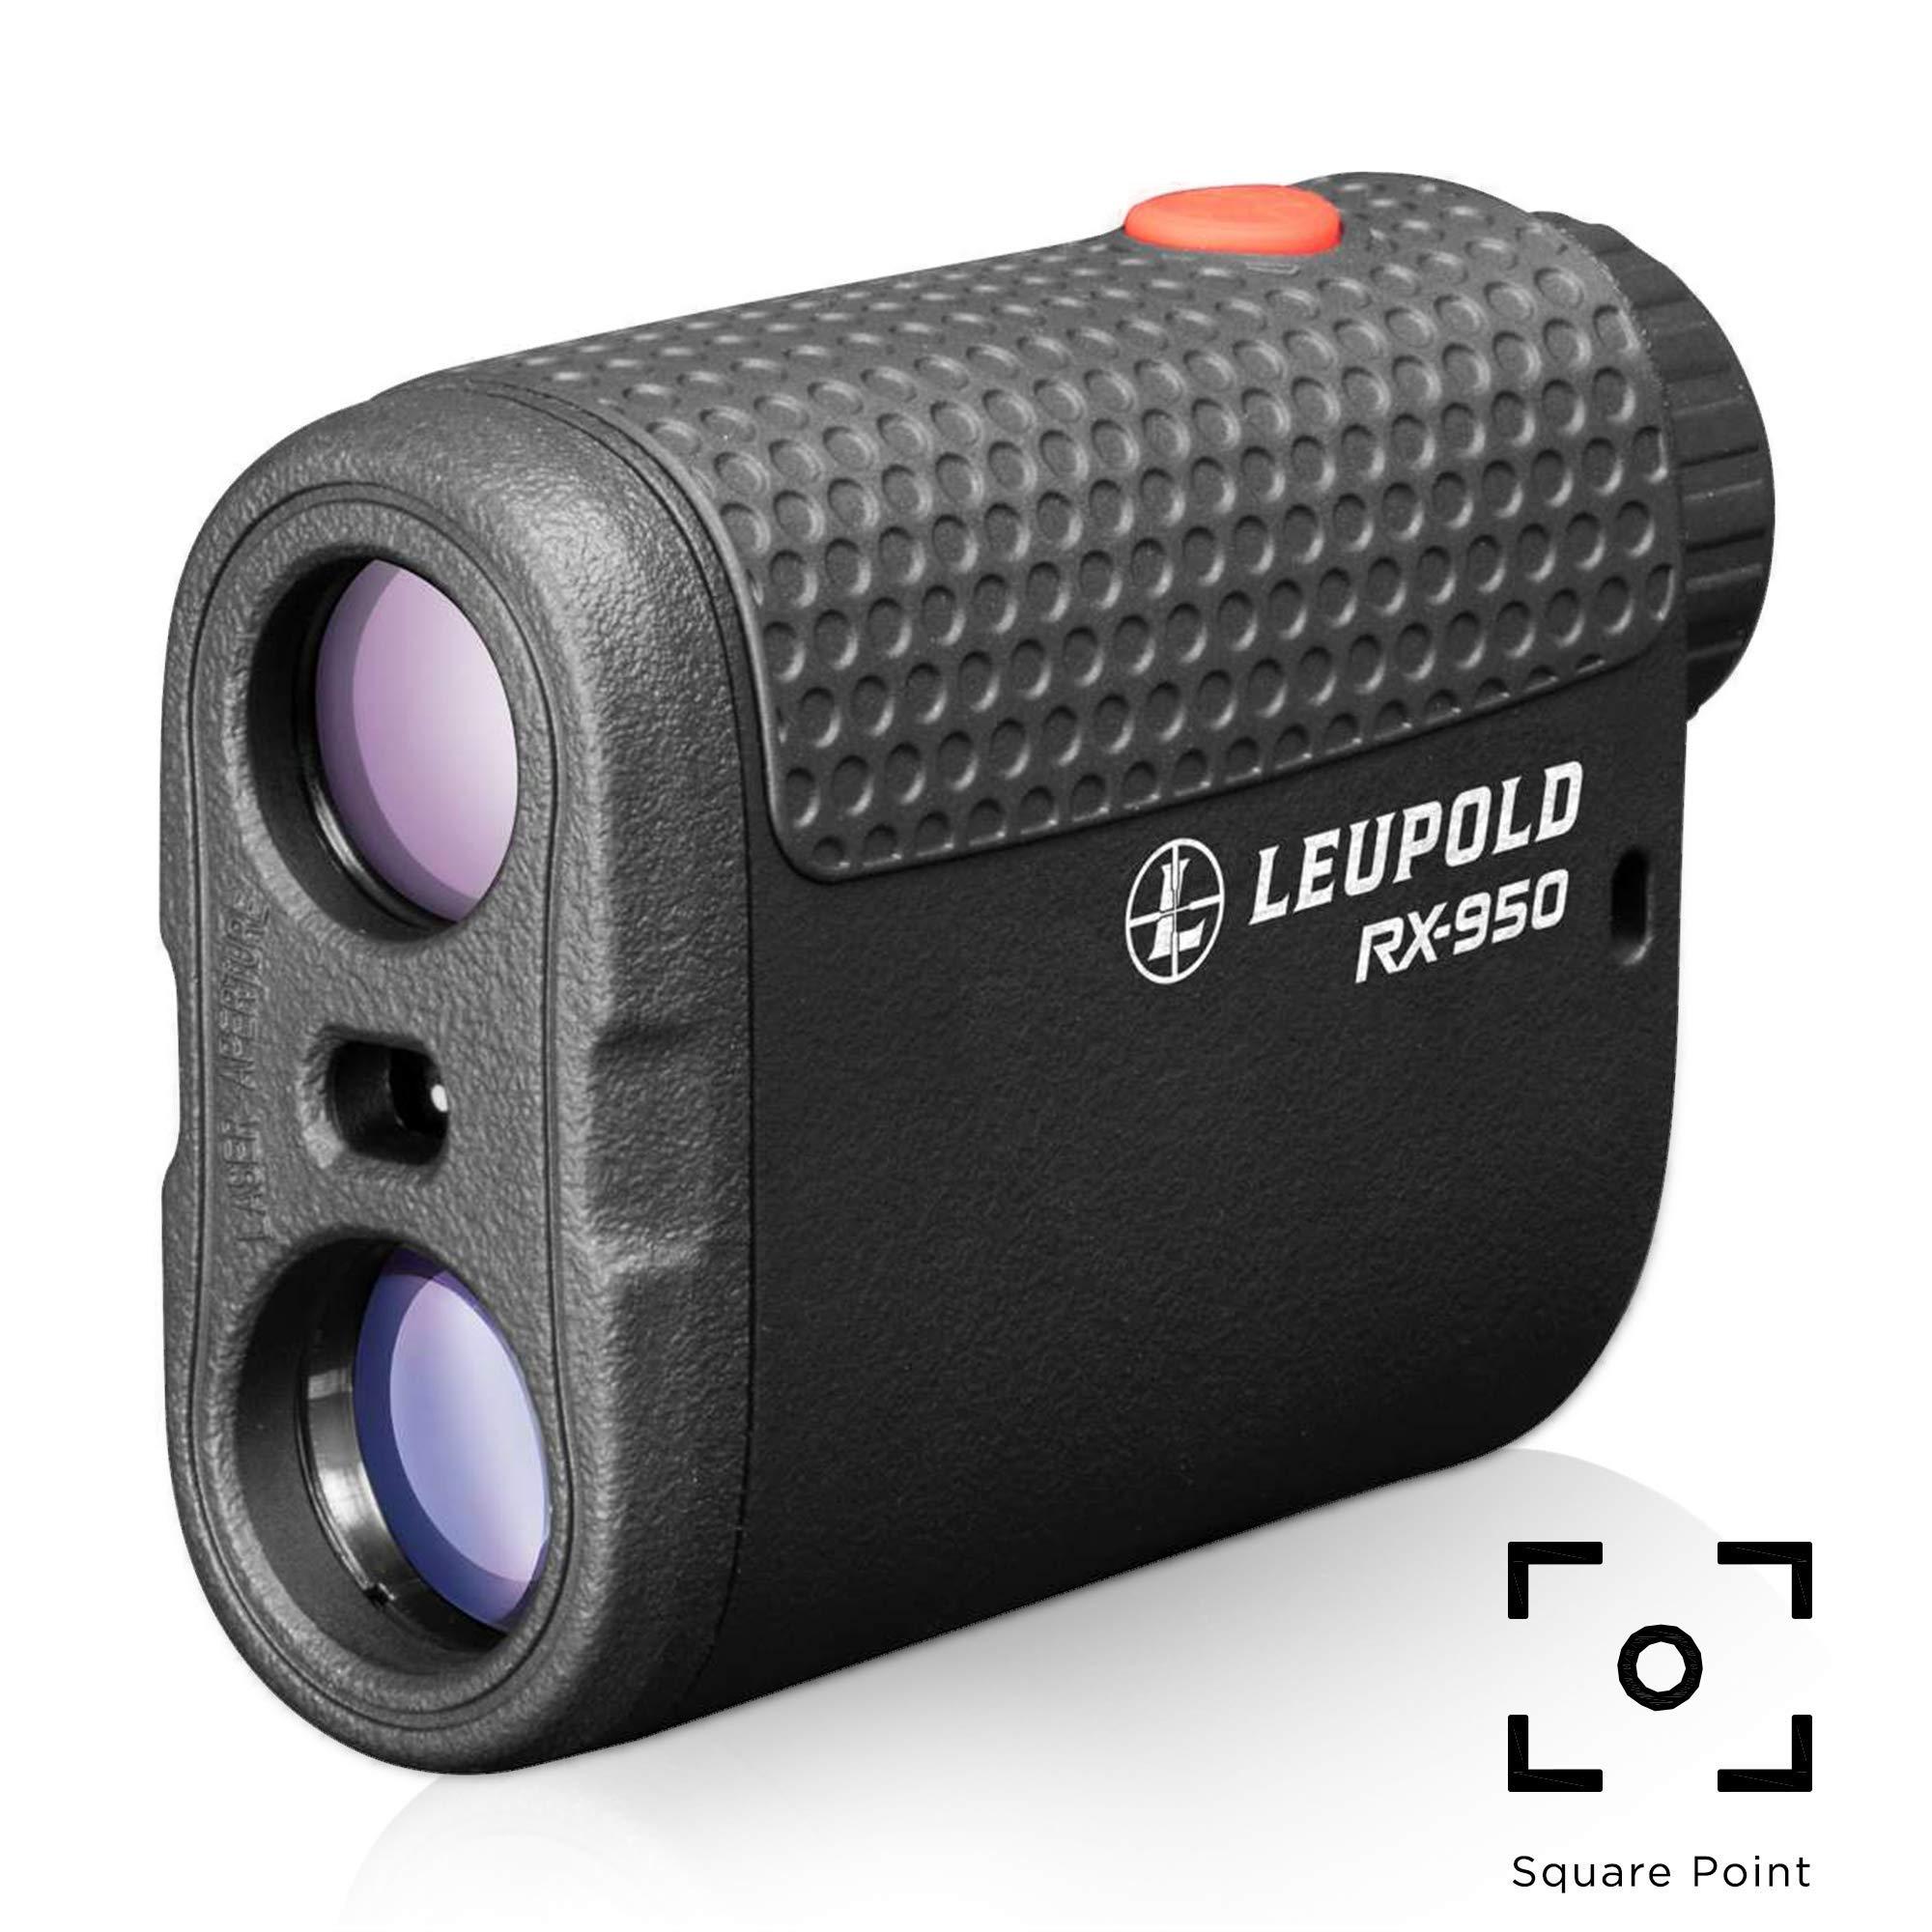 Leupold RX-950 Laser Rangefinder by Leupold